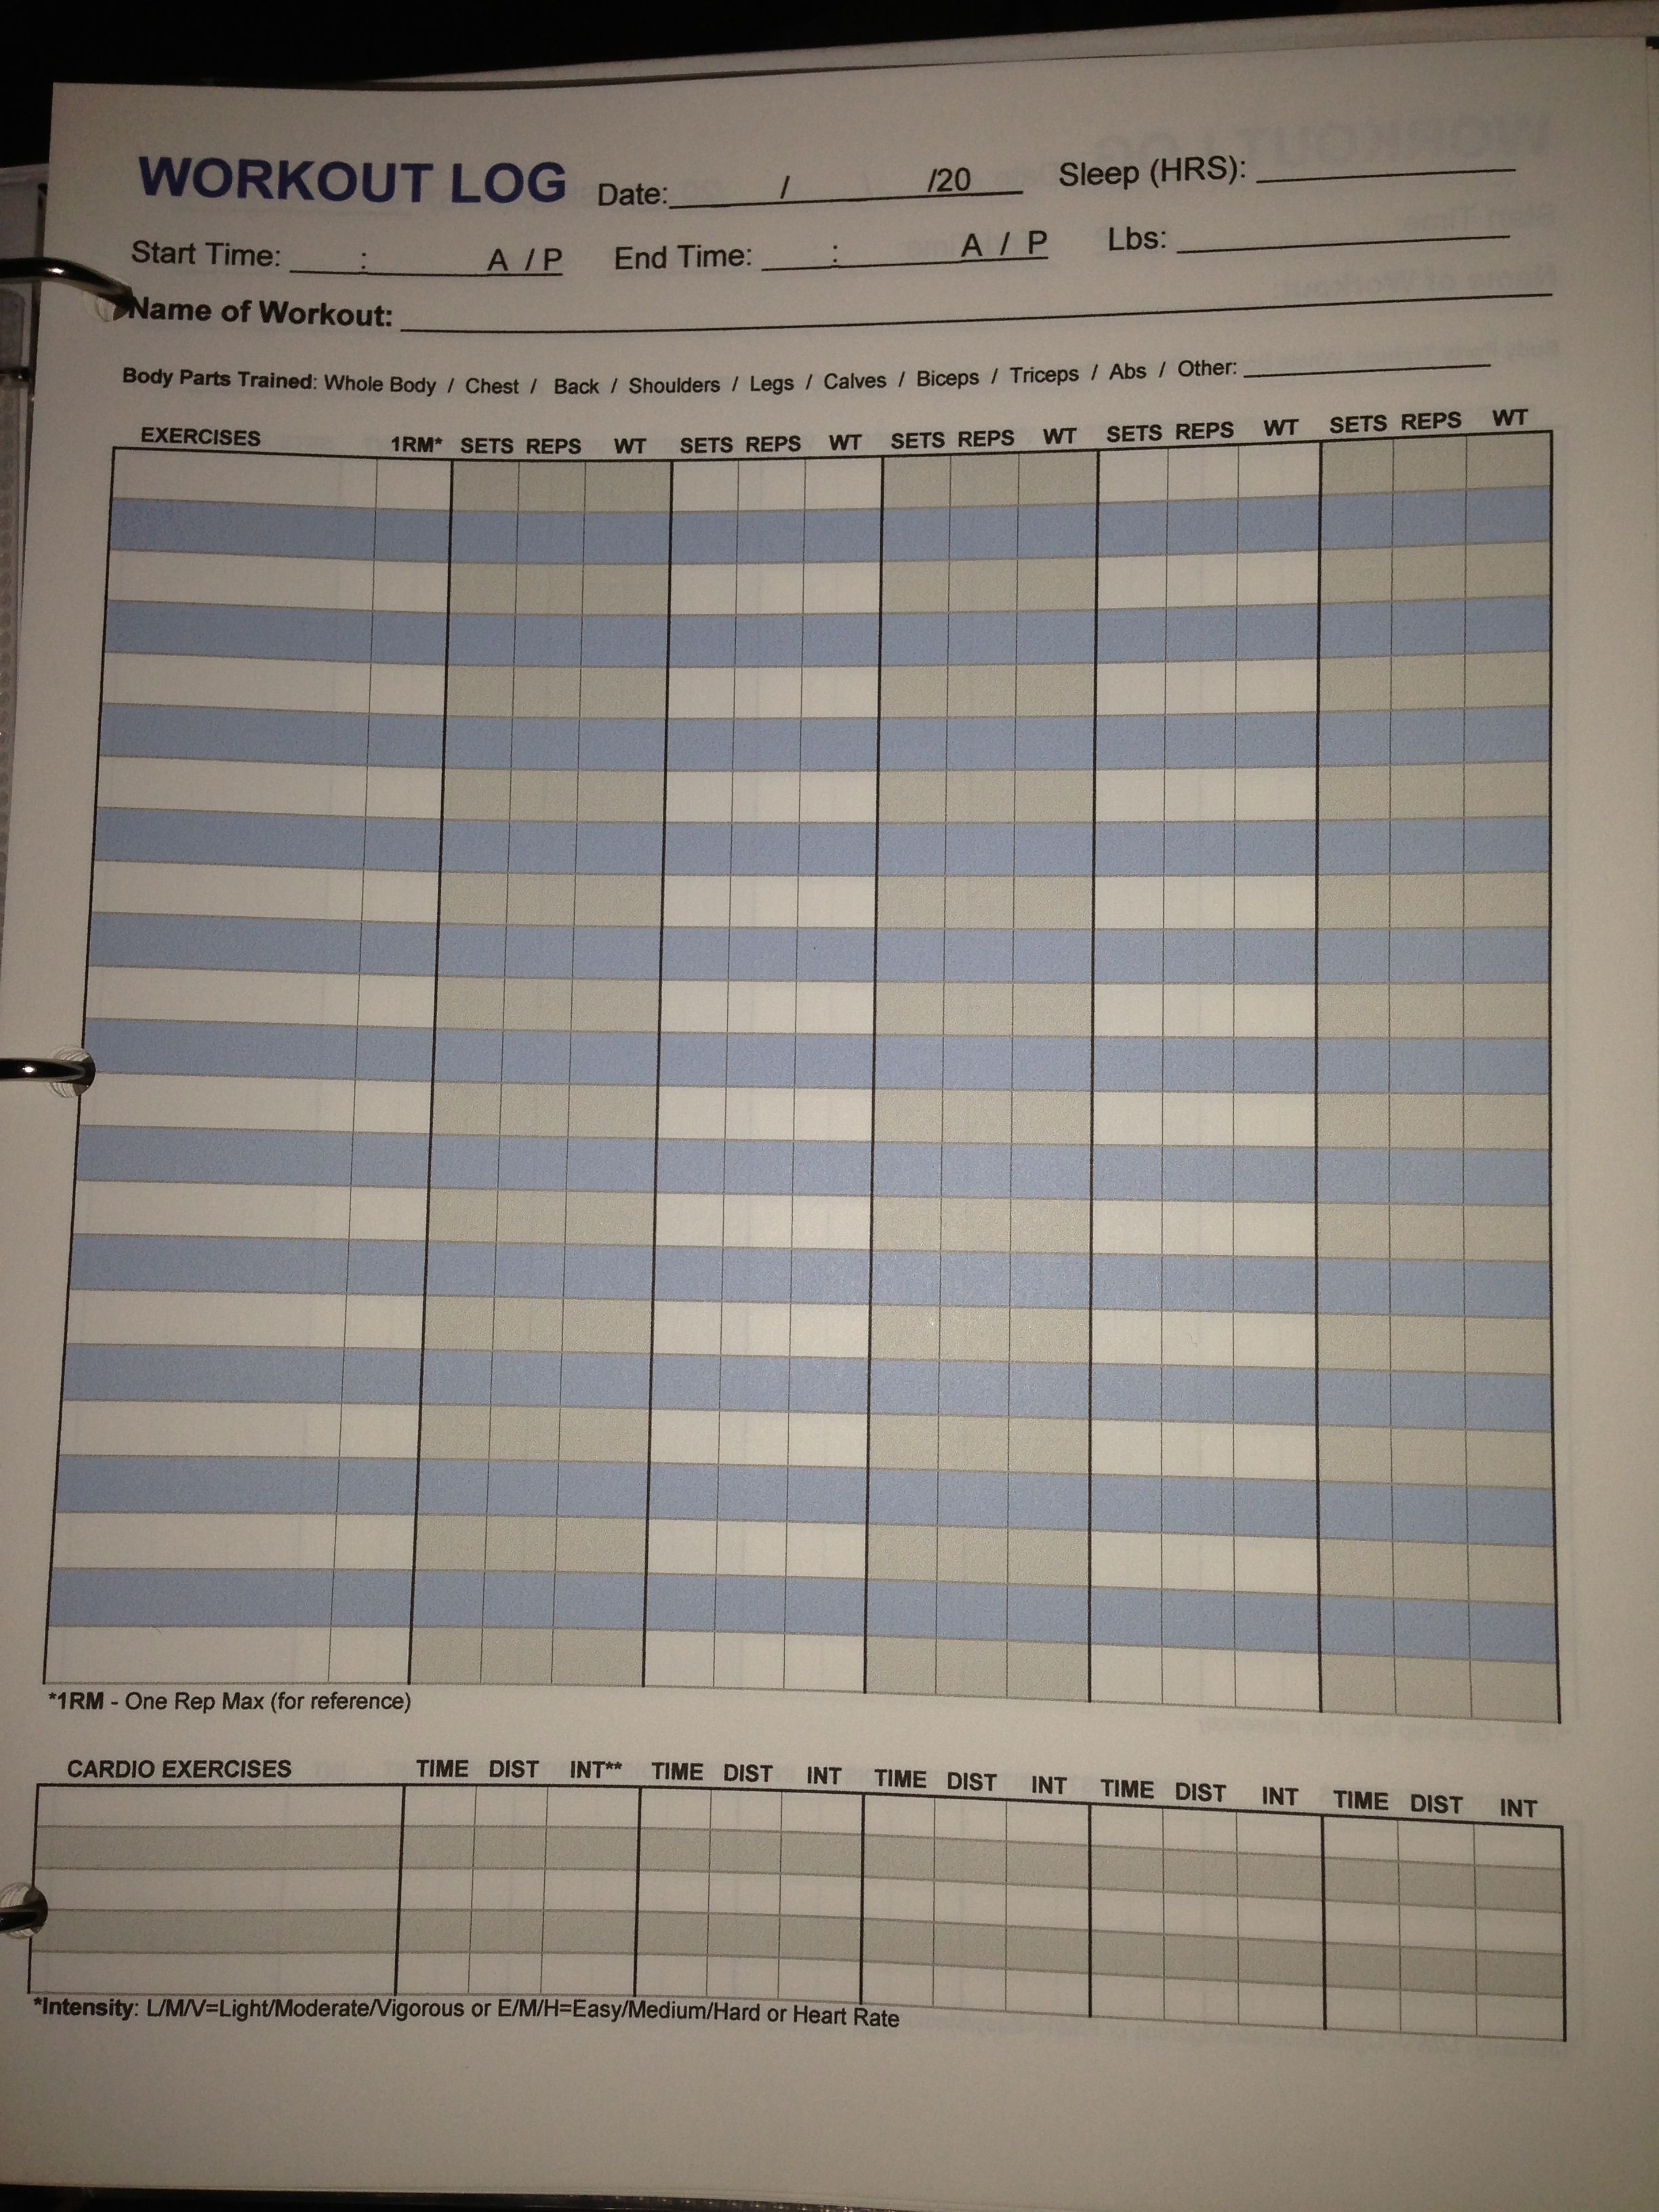 Workout Log Sample Worksheet Workout Log Workout Schedule